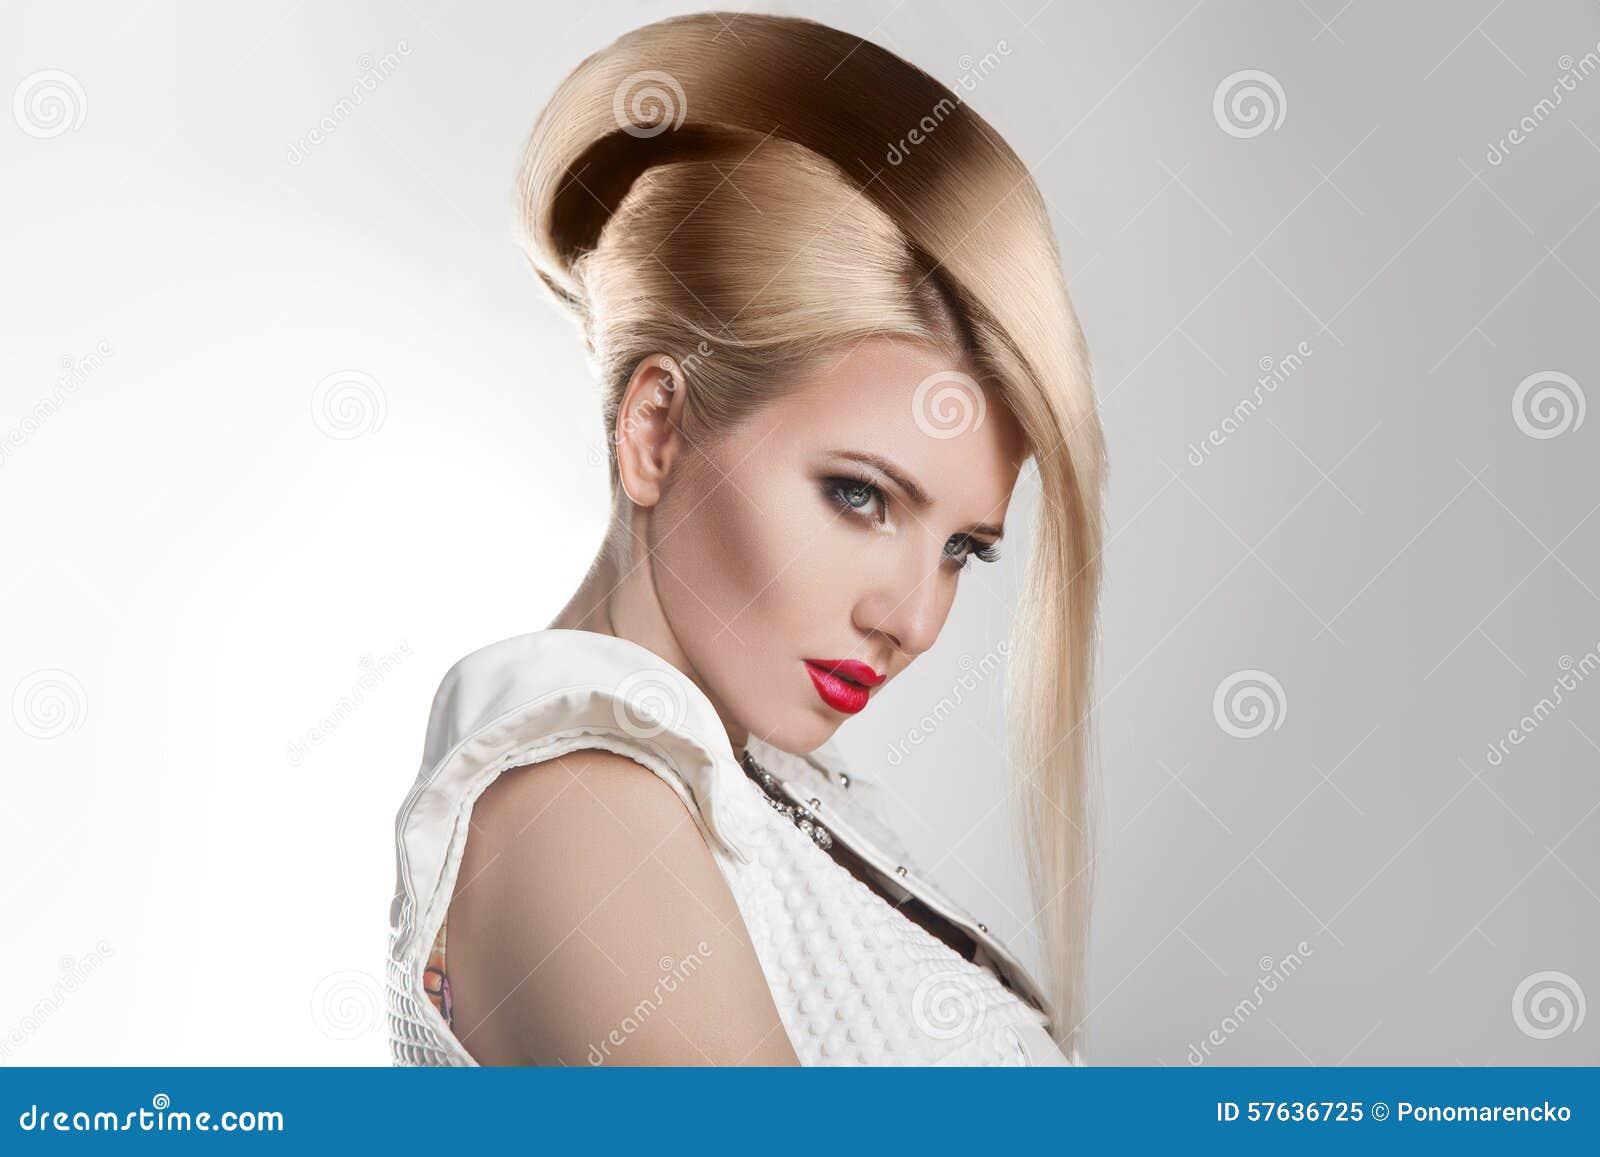 Frisuren fur madchen kurze haare